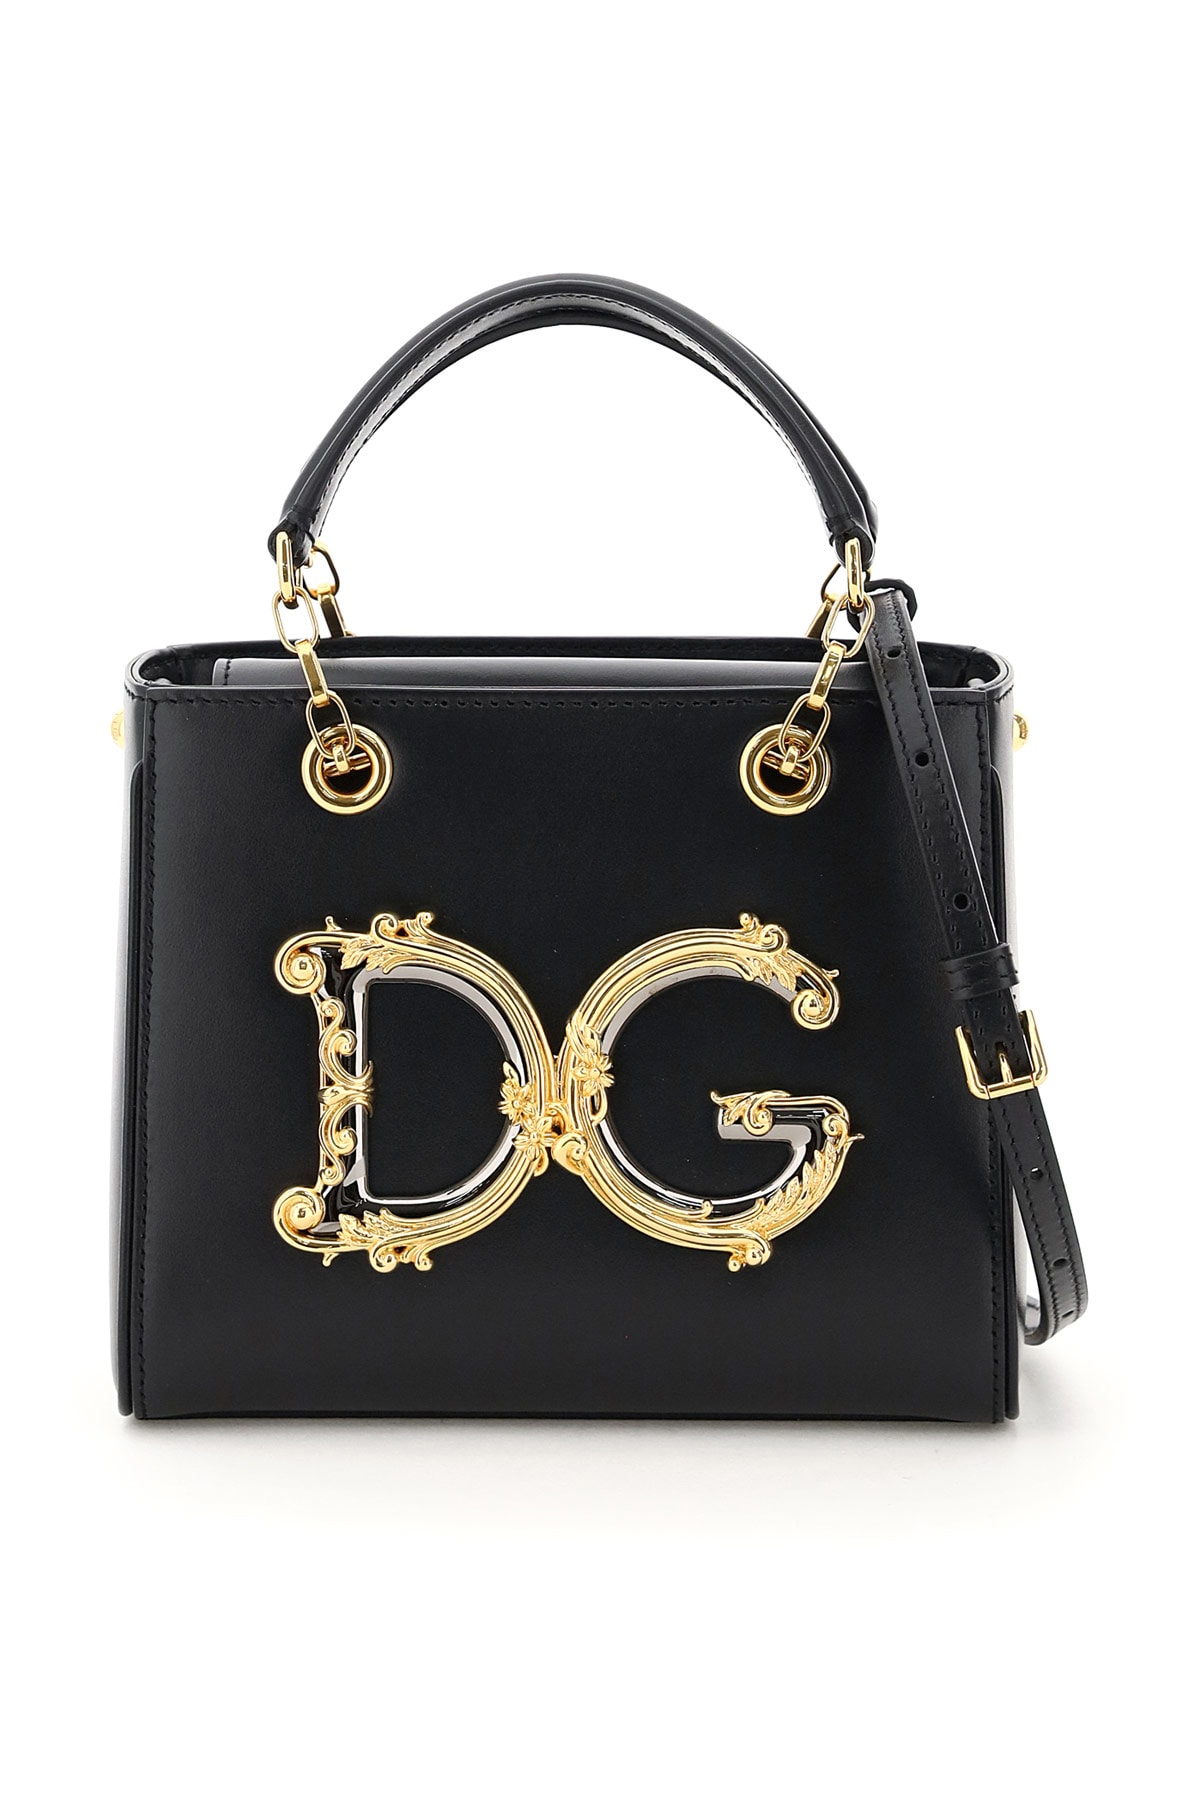 Dolce & Gabbana DG GIRL HANDBAG BAROQUE